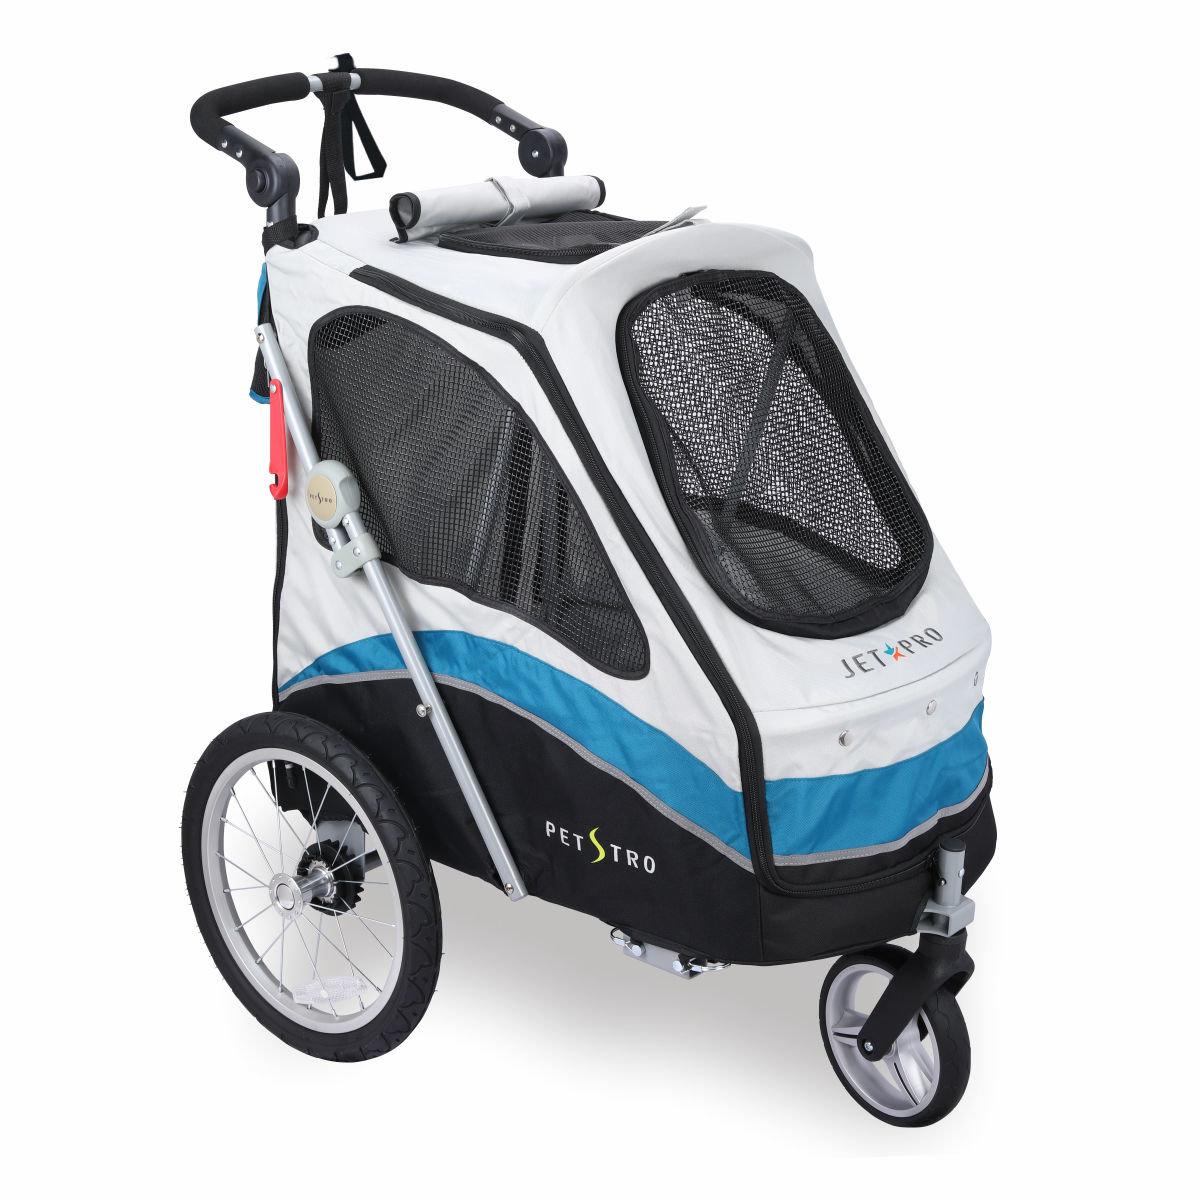 706GX-WB Pet Stroller (Wing/Blue)